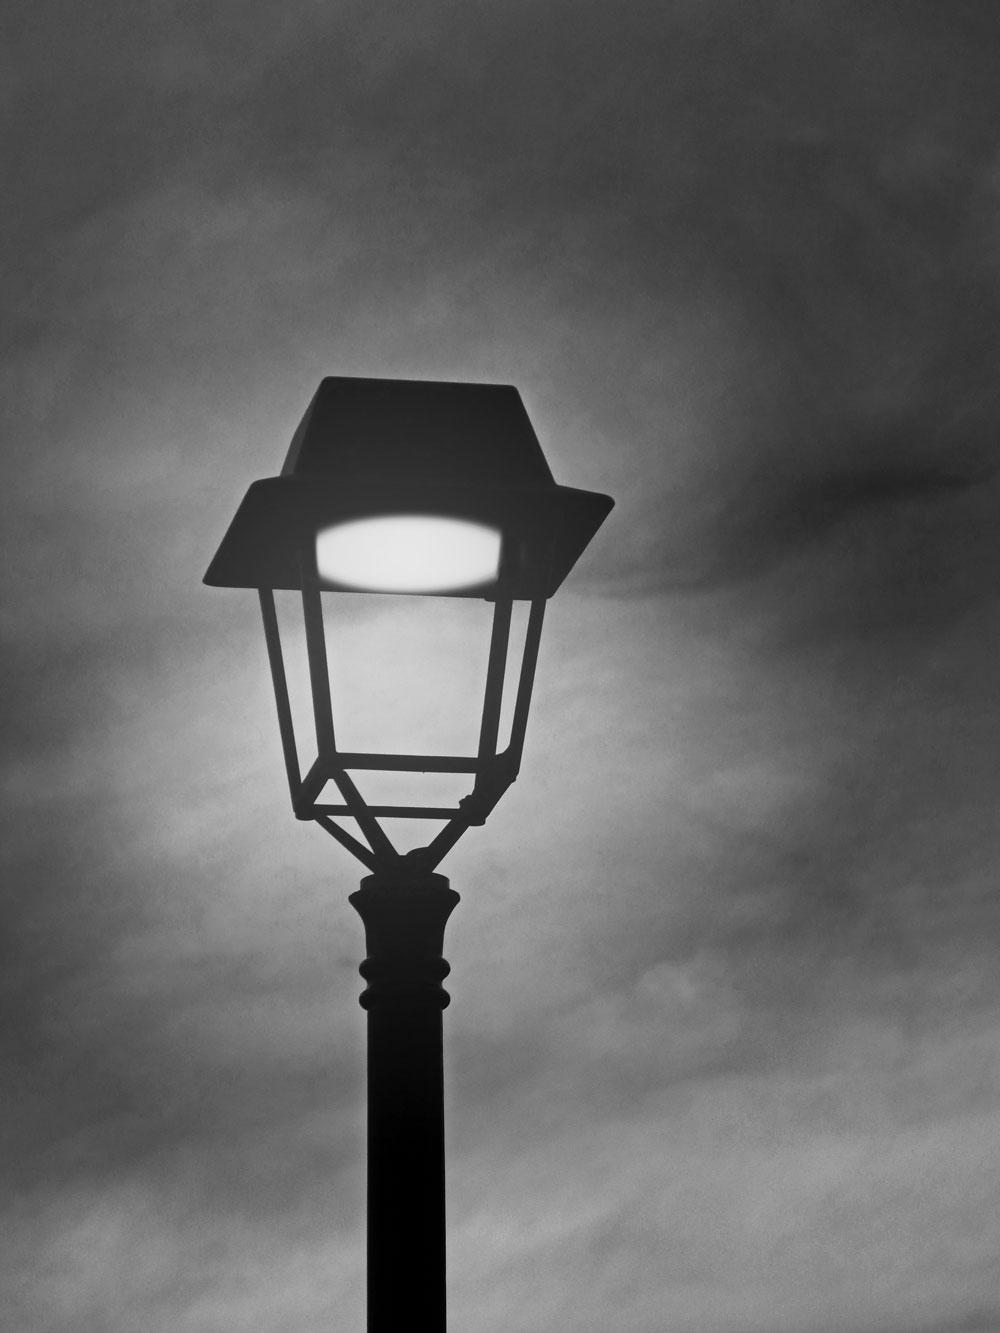 street-lamp-3235028_1920